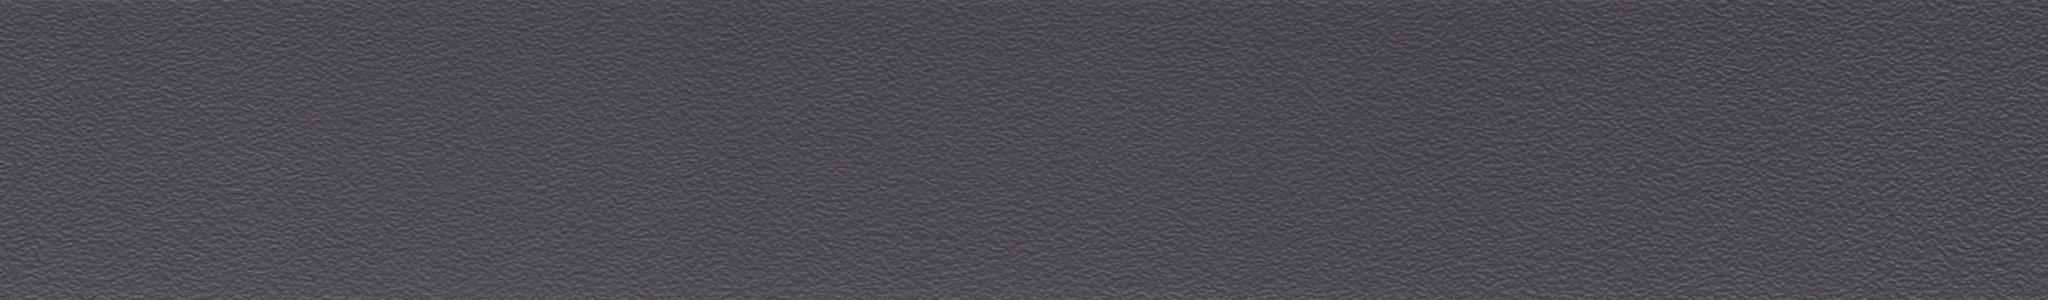 HU 181980 кромка ABS terra коричневая жемчуг XG